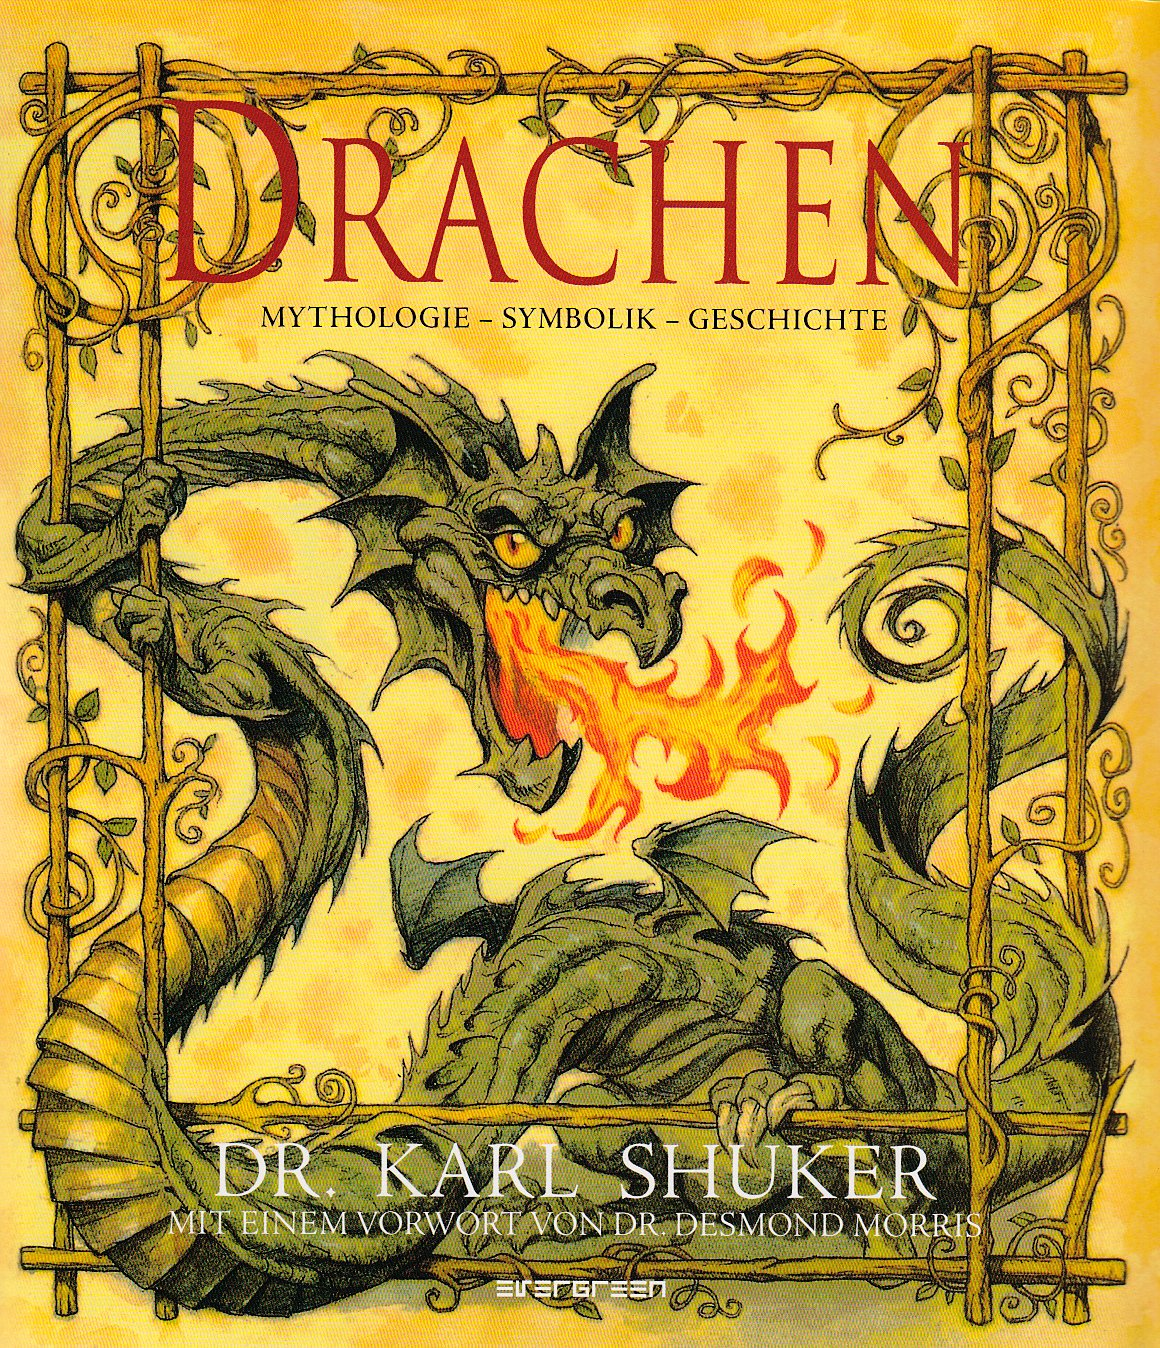 Drachen. Mythologie - Symbolik - Geschichte